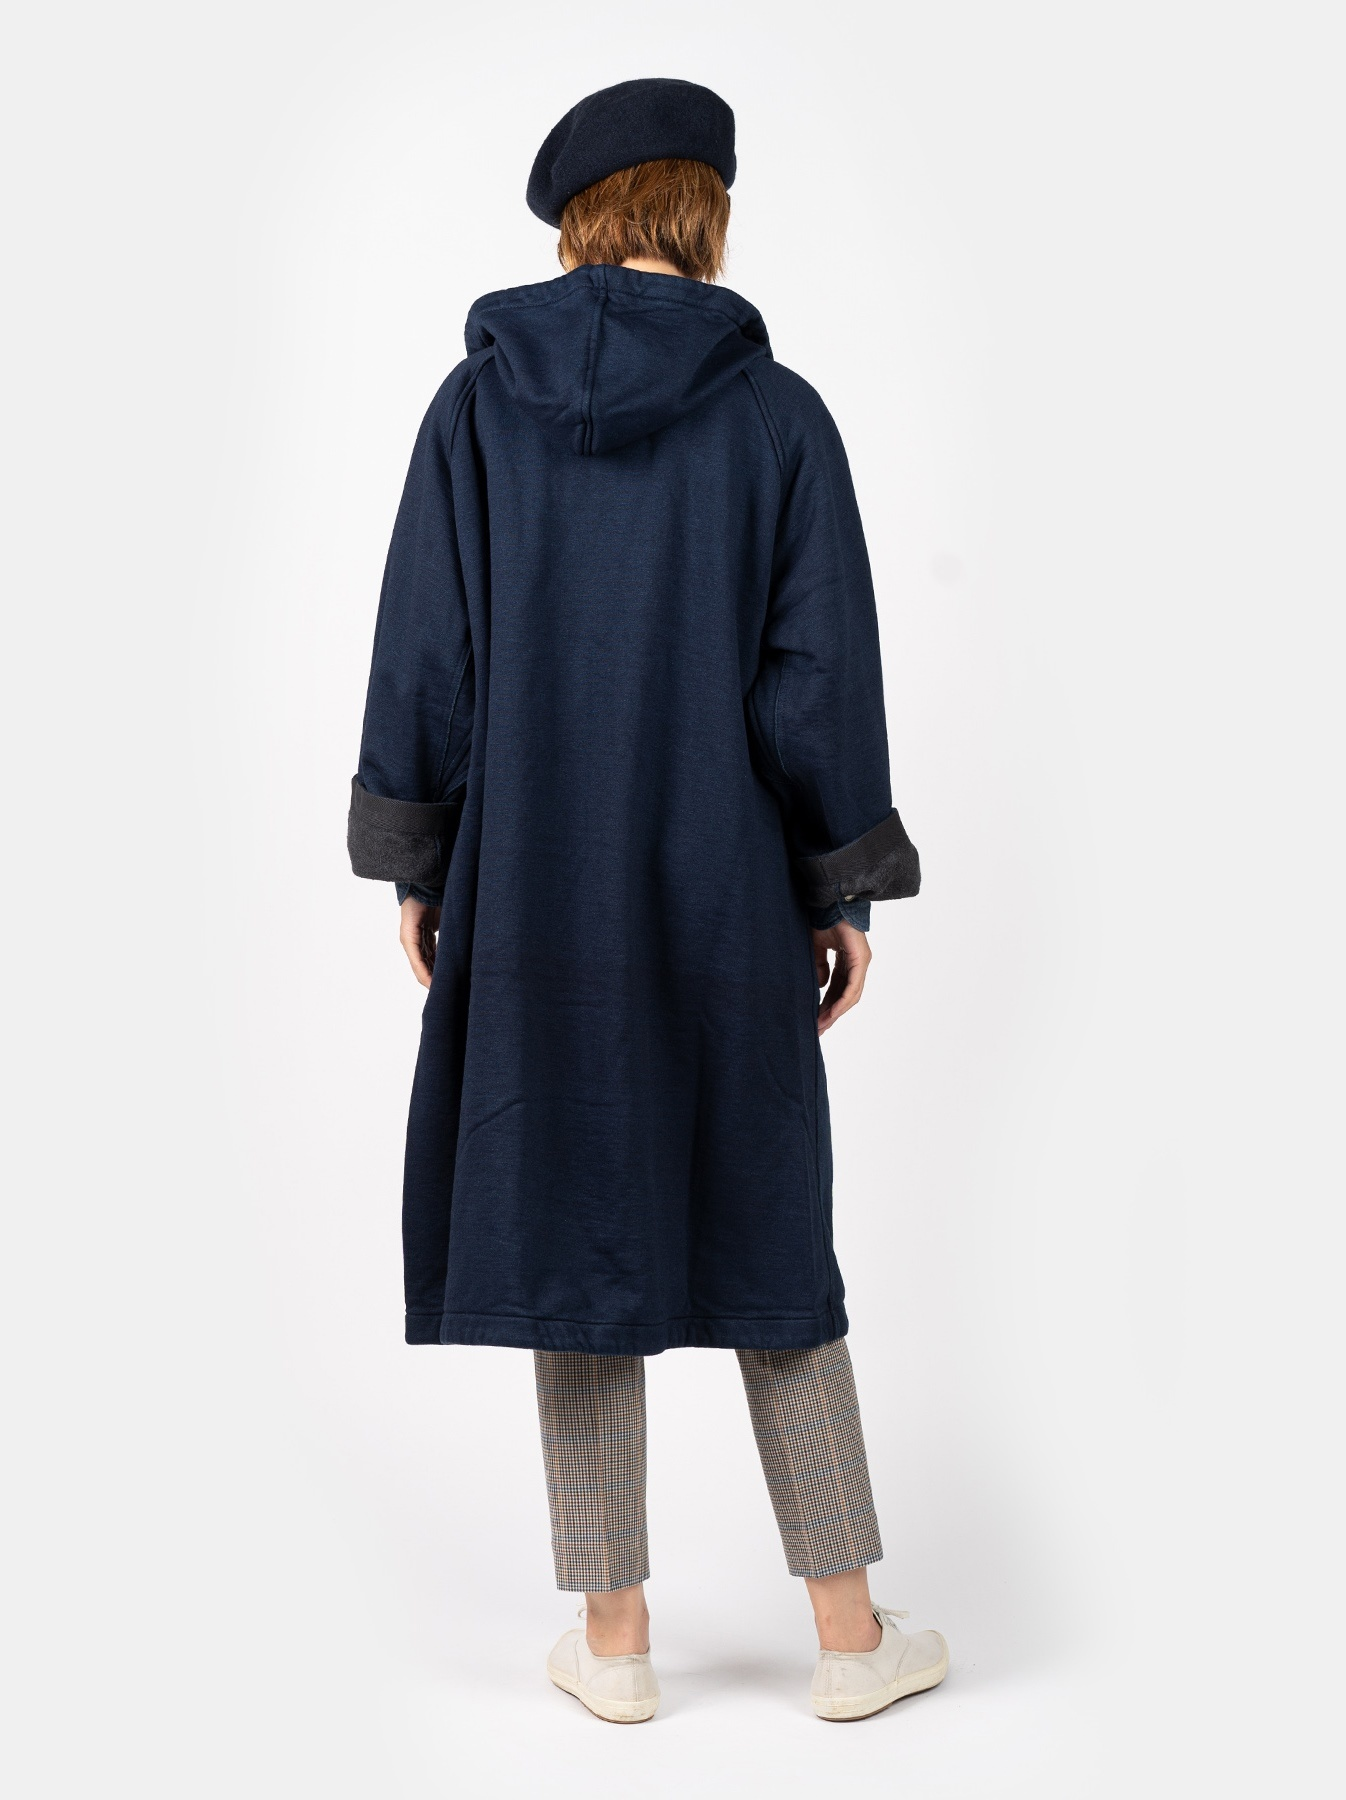 WH Indigo Mouton Fleecy 908 Hoodie Coat-4